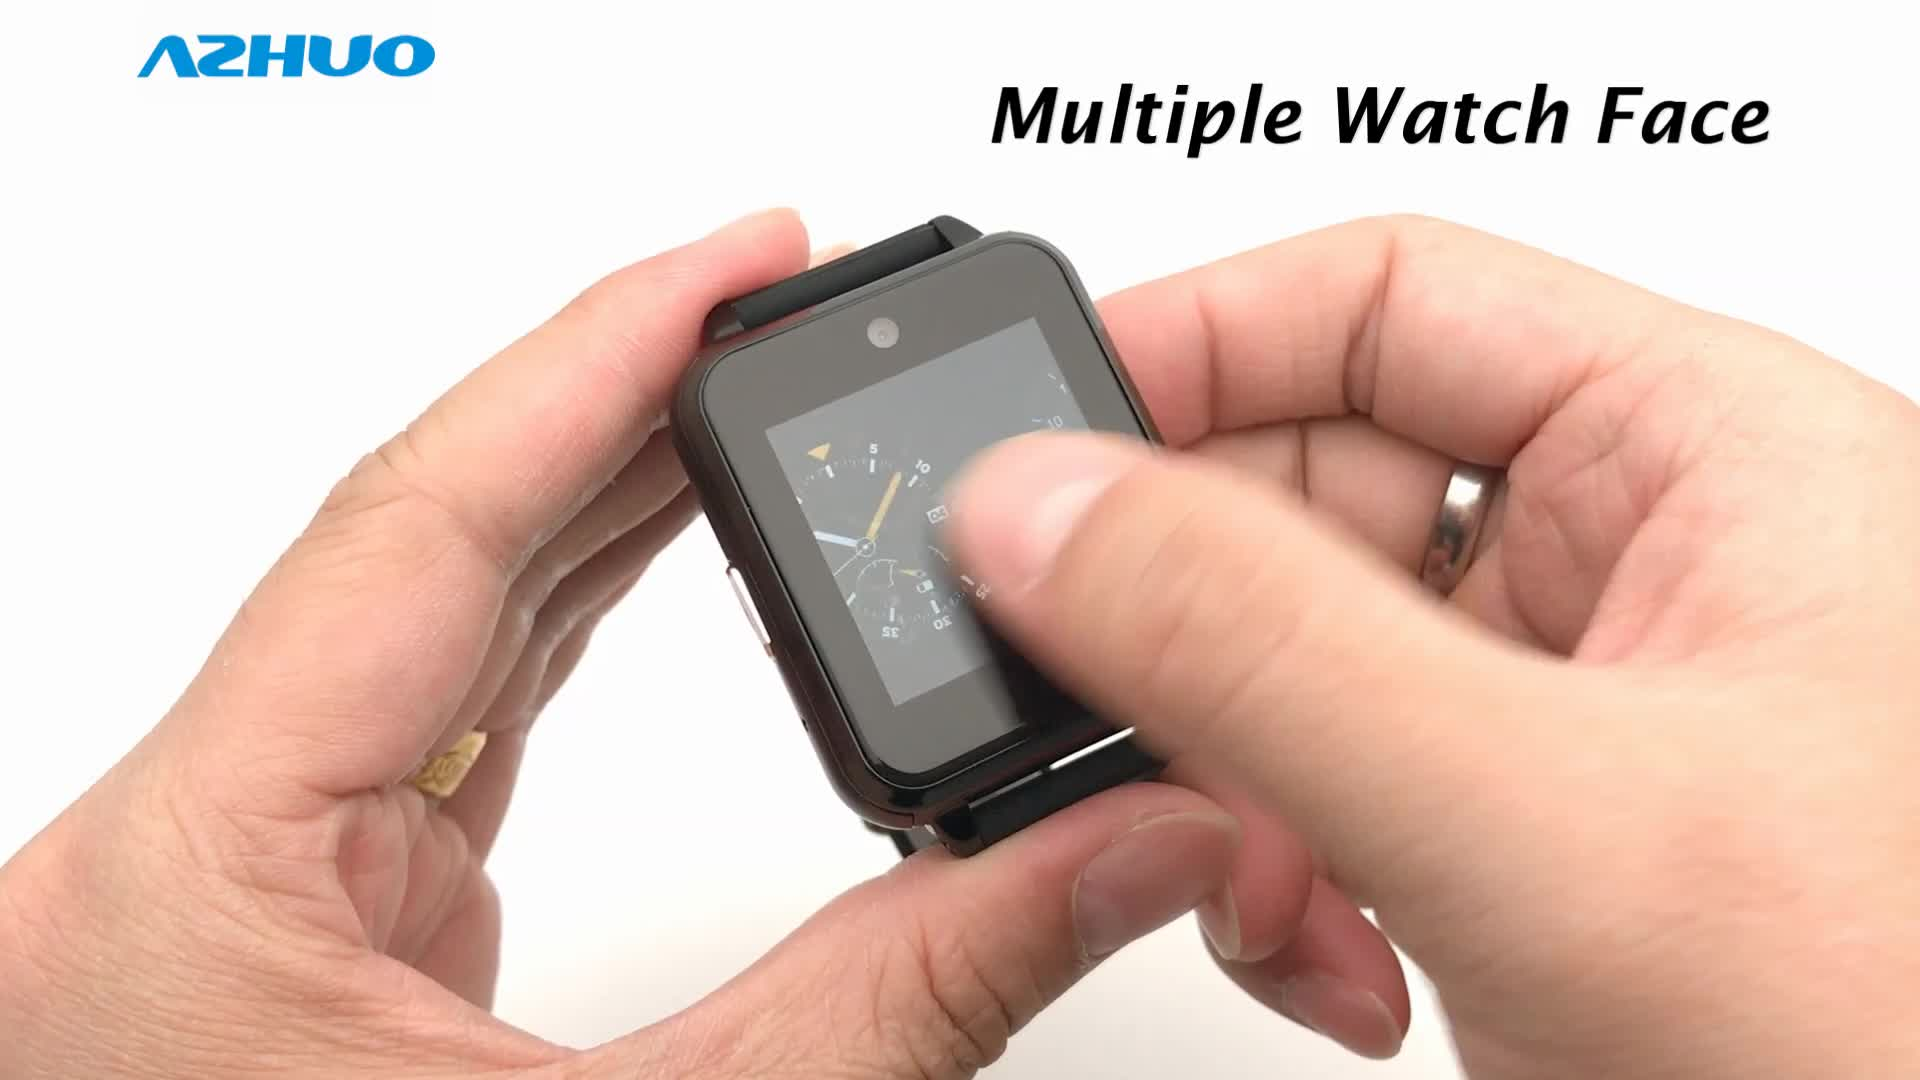 Q1 Pro yeni Q2 4G akıllı saat MTK6737 dört çekirdekli 1GB RAM 16GB ROM Android 6.0 Wifi GPS kamera kalp hızı kan basıncı Smartwatch